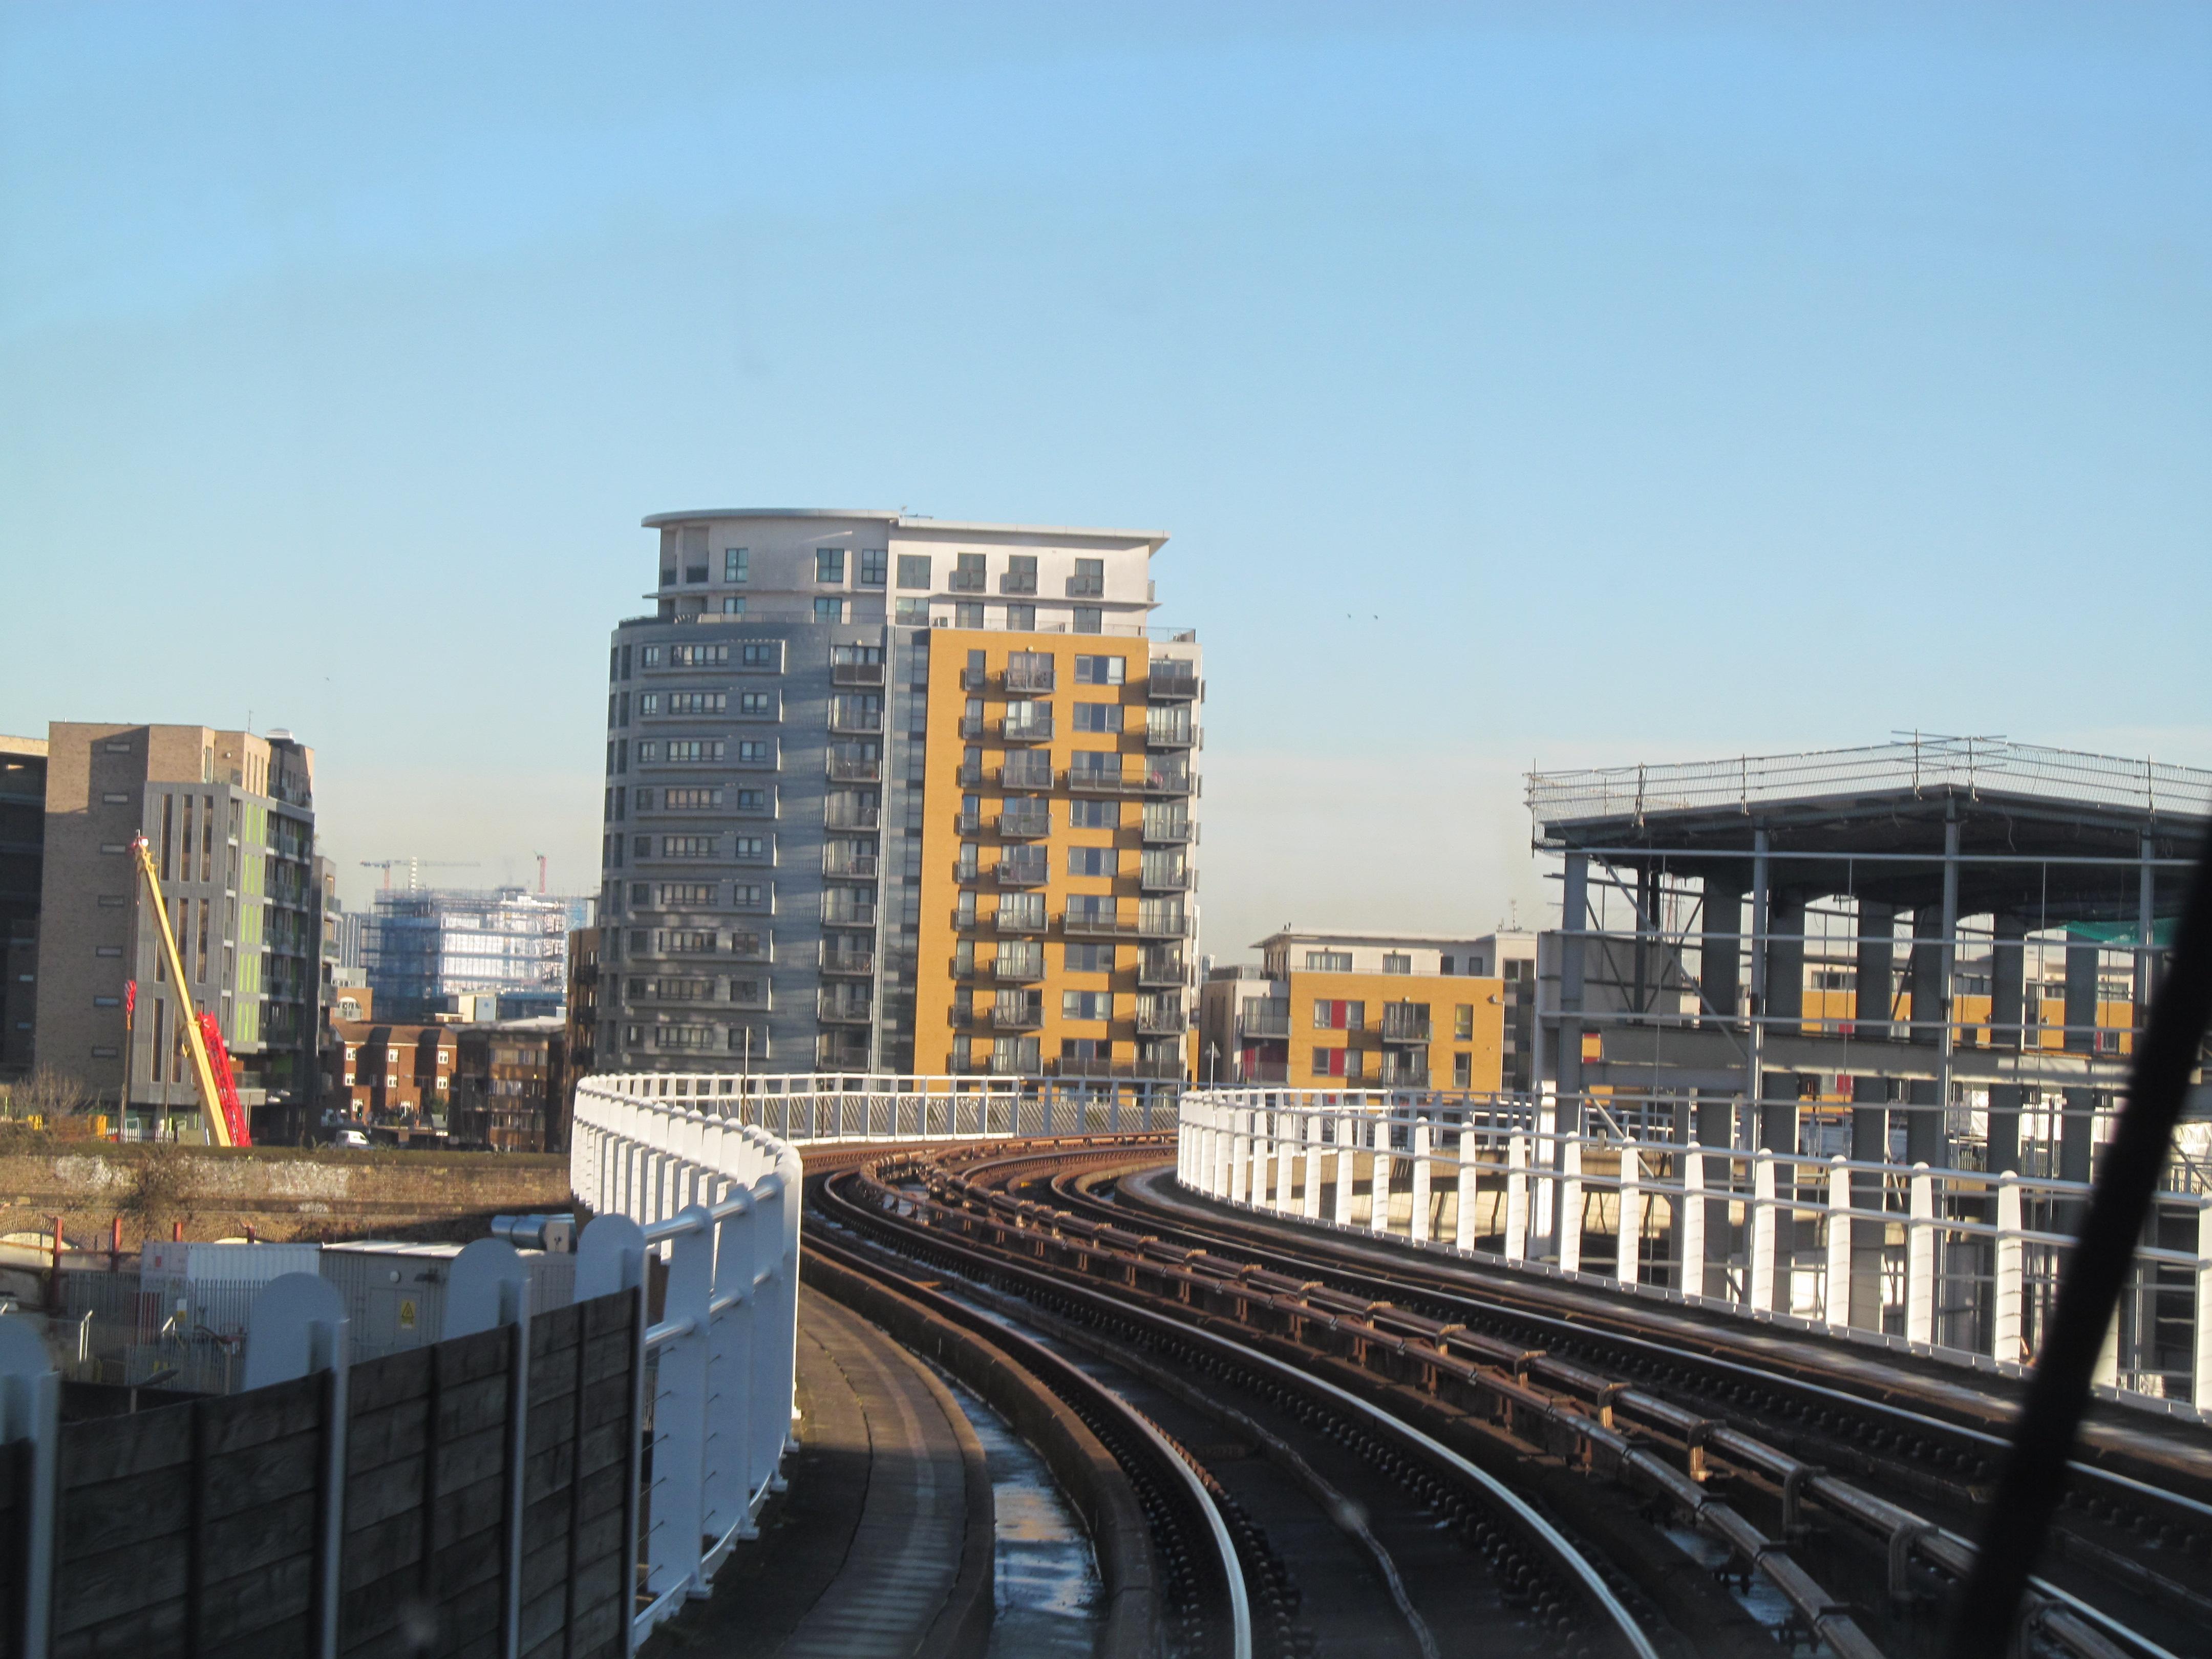 Decent public transport passenger growth continues in latest figures